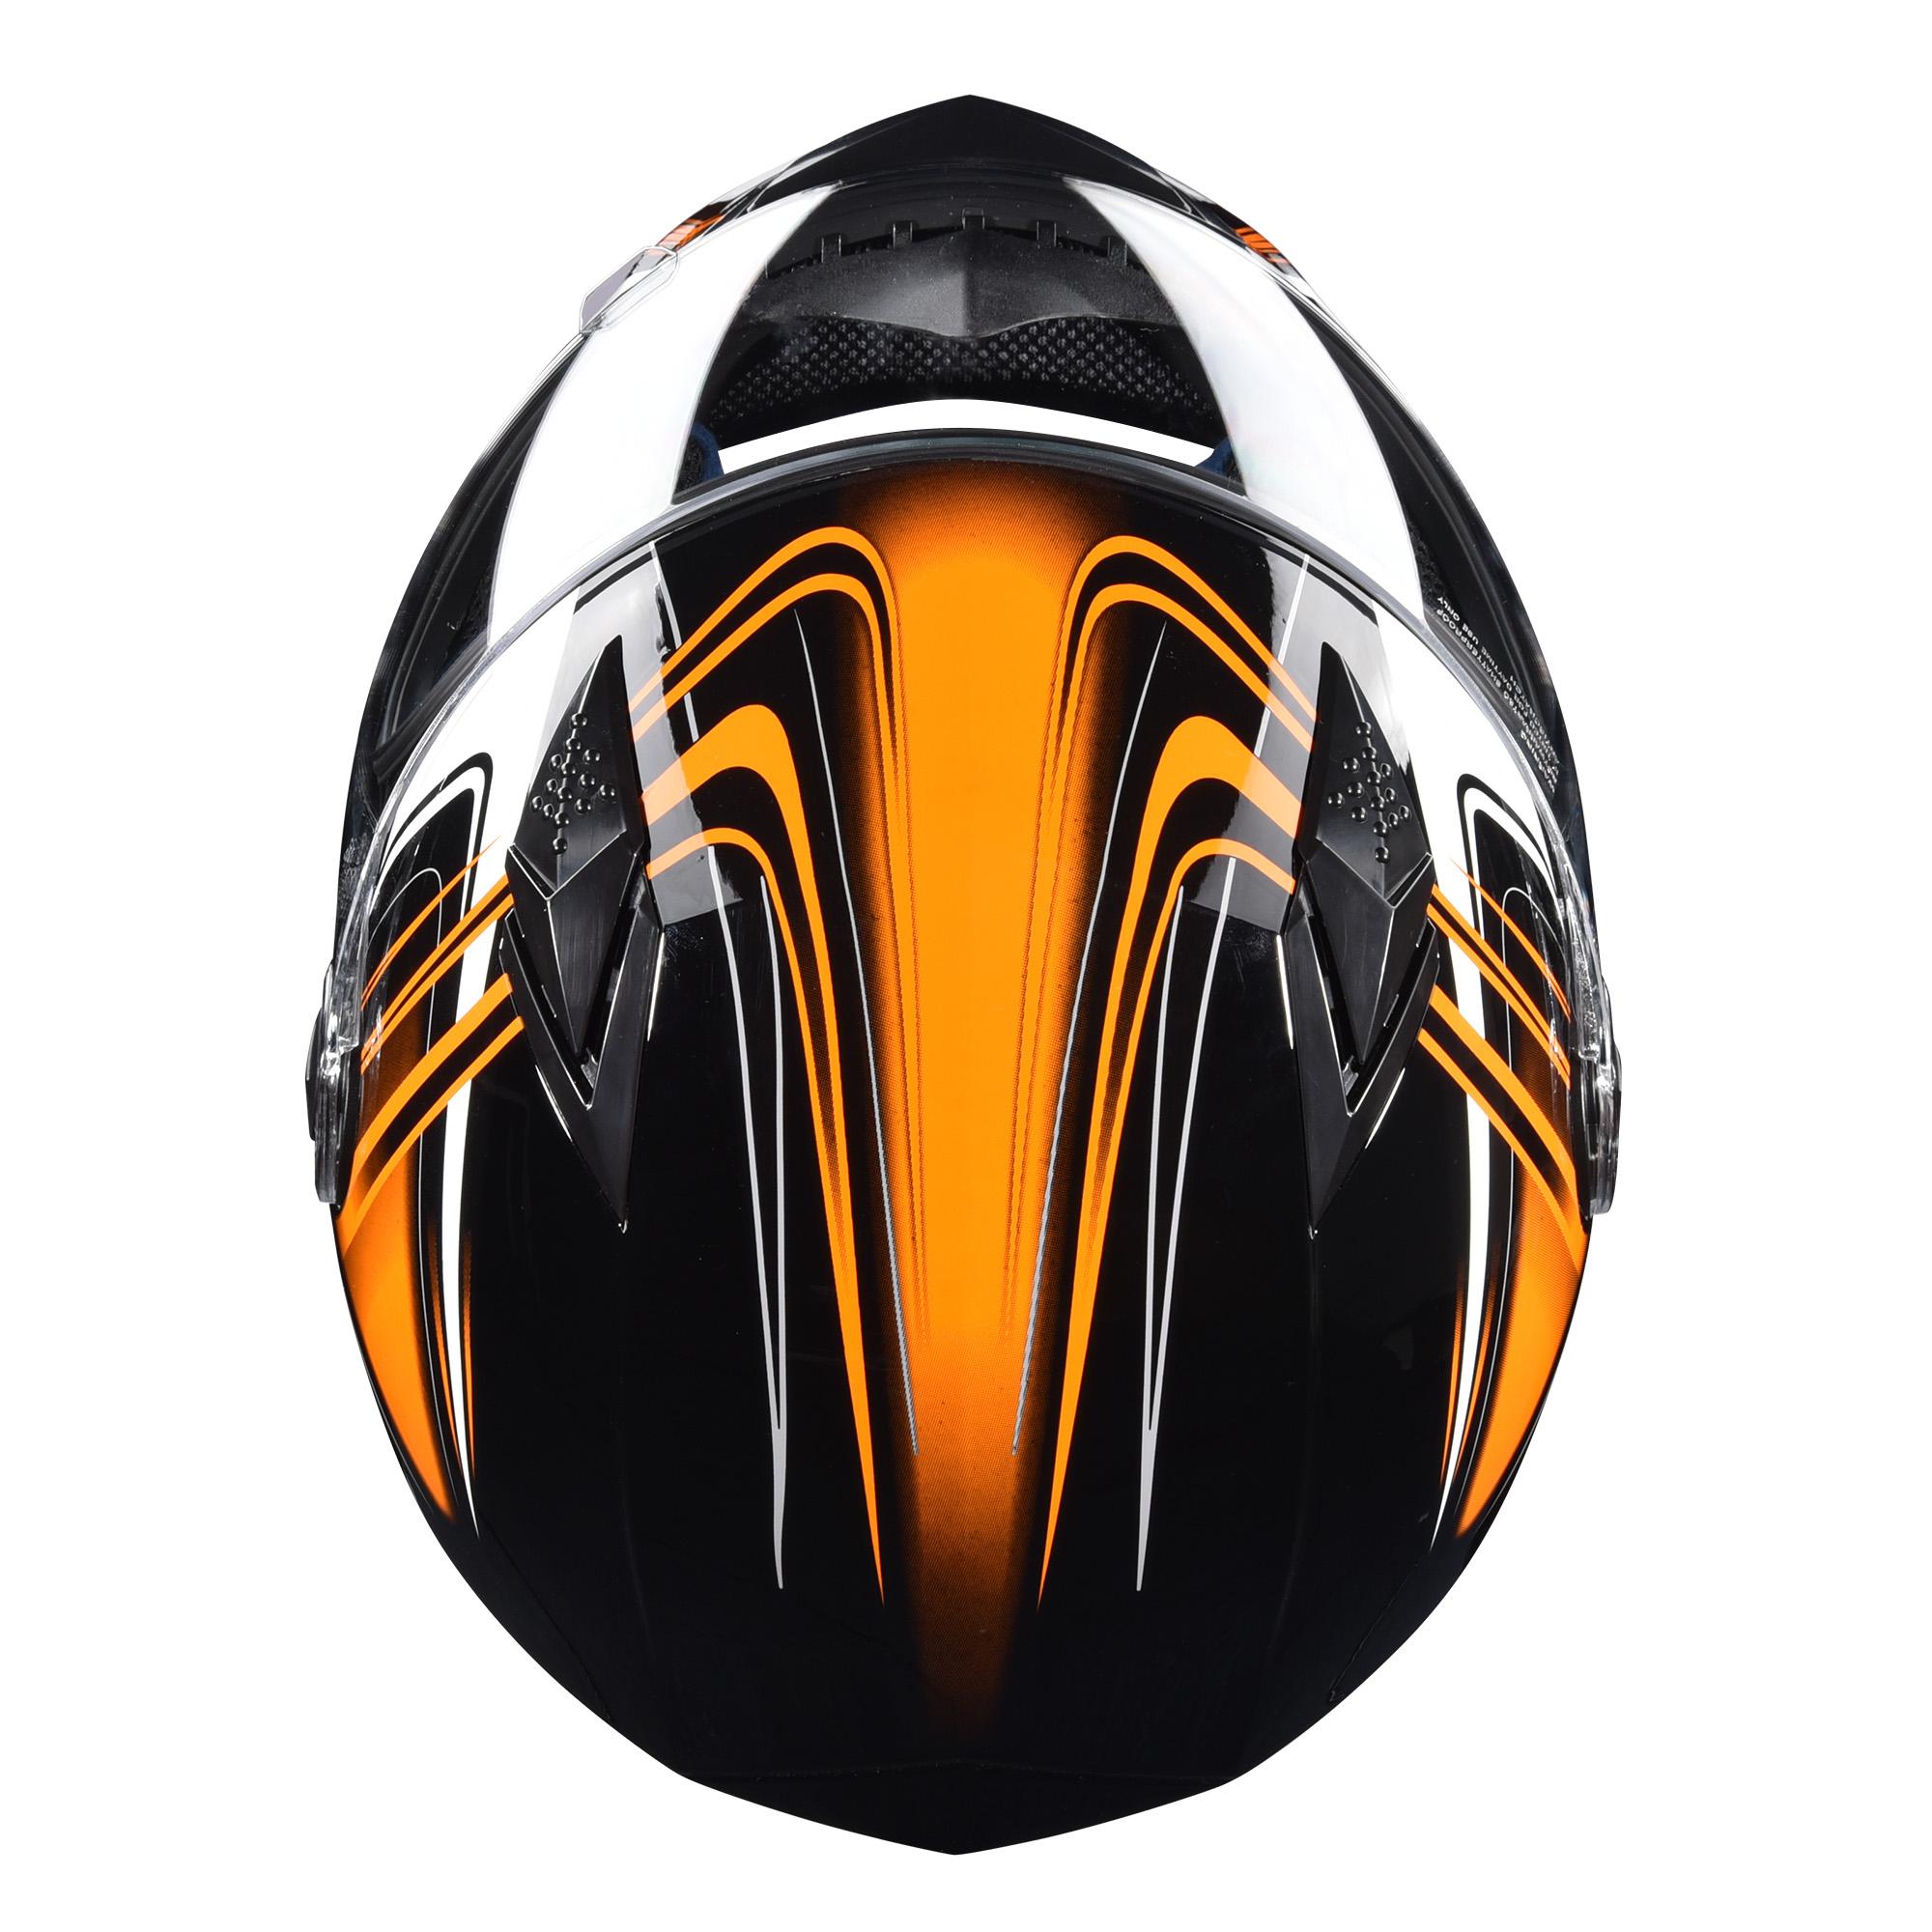 miniature 114 - AHR K12 Full Face Motorcycle Helmet DOT Air Vents Clear Visor Racing S M L XL